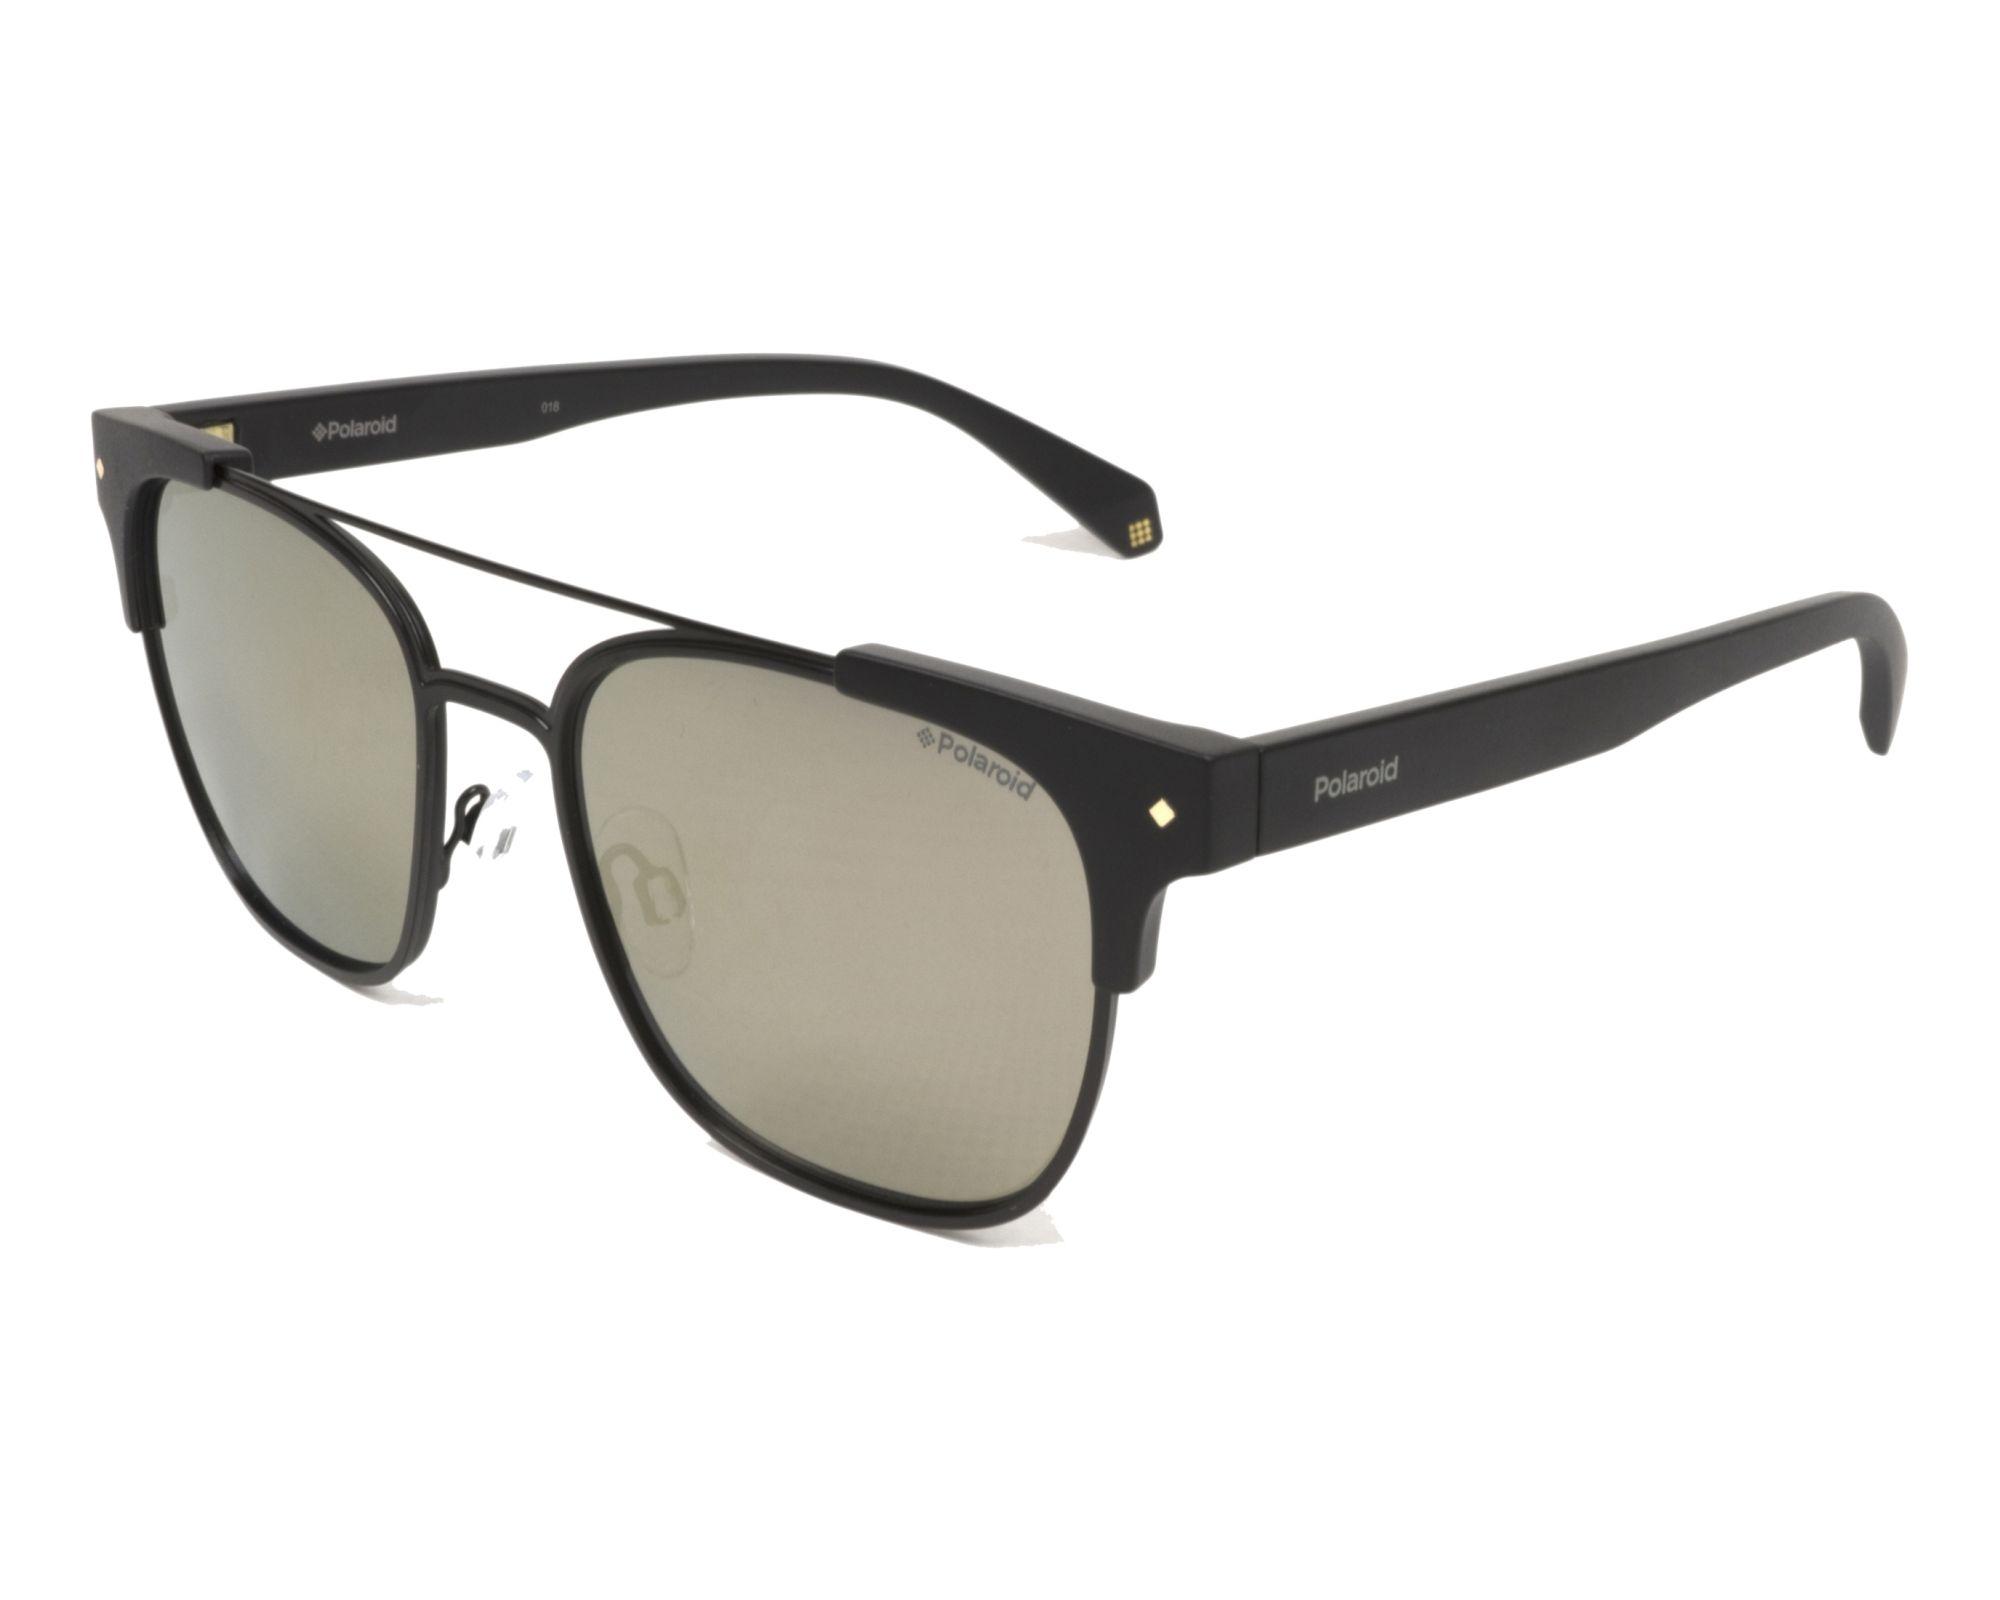 Gafas de sol Polaroid PLD-6039-S-X 003 LM 54-18 Negra c8bac96fc6